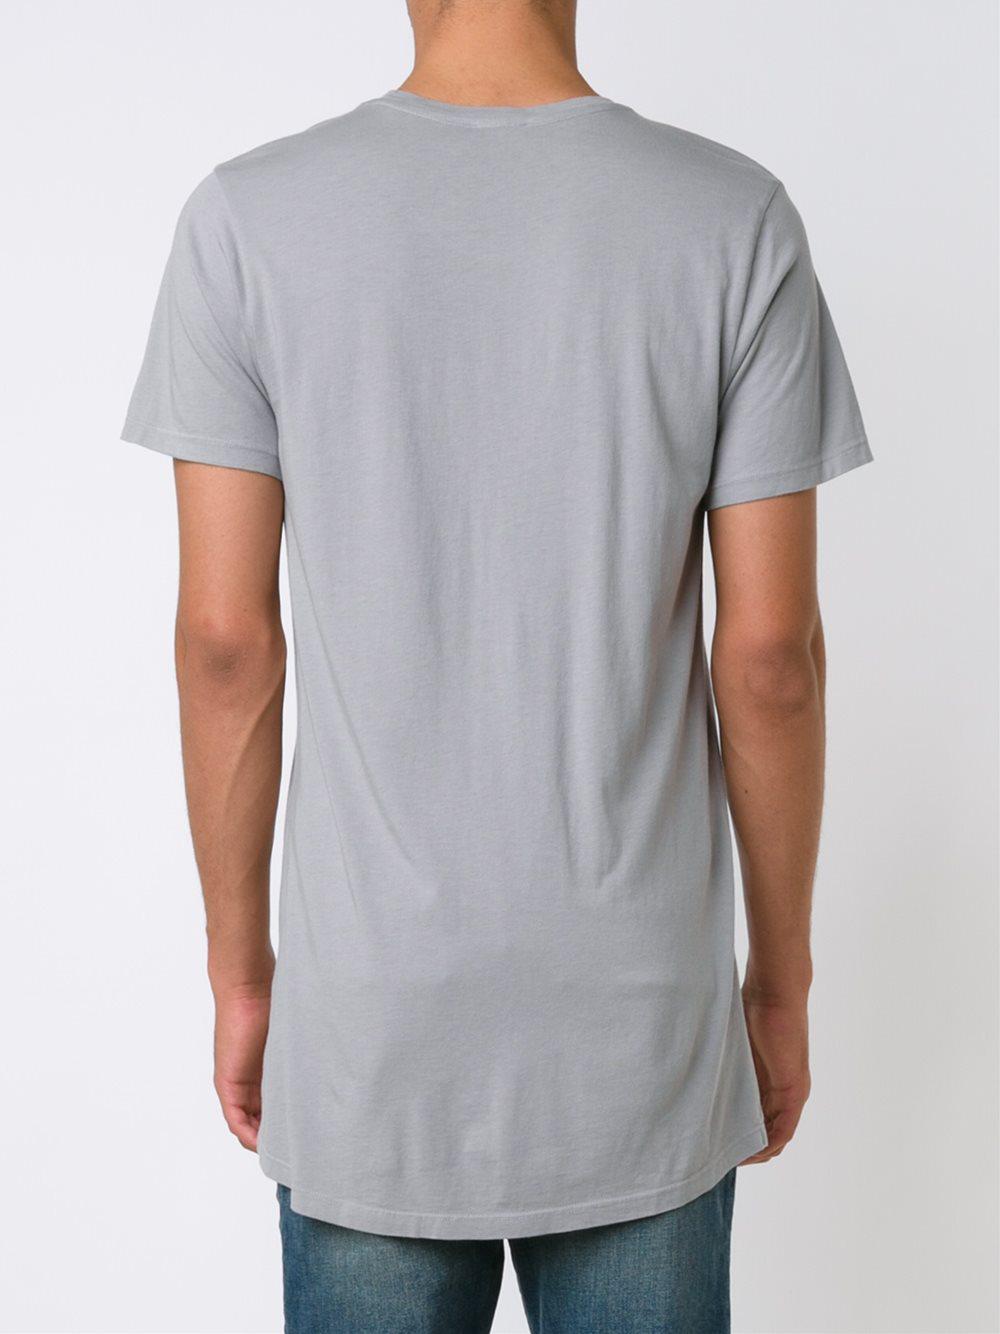 En Noir Oversized T Shirt In Gray For Men Lyst Grey View Fullscreen